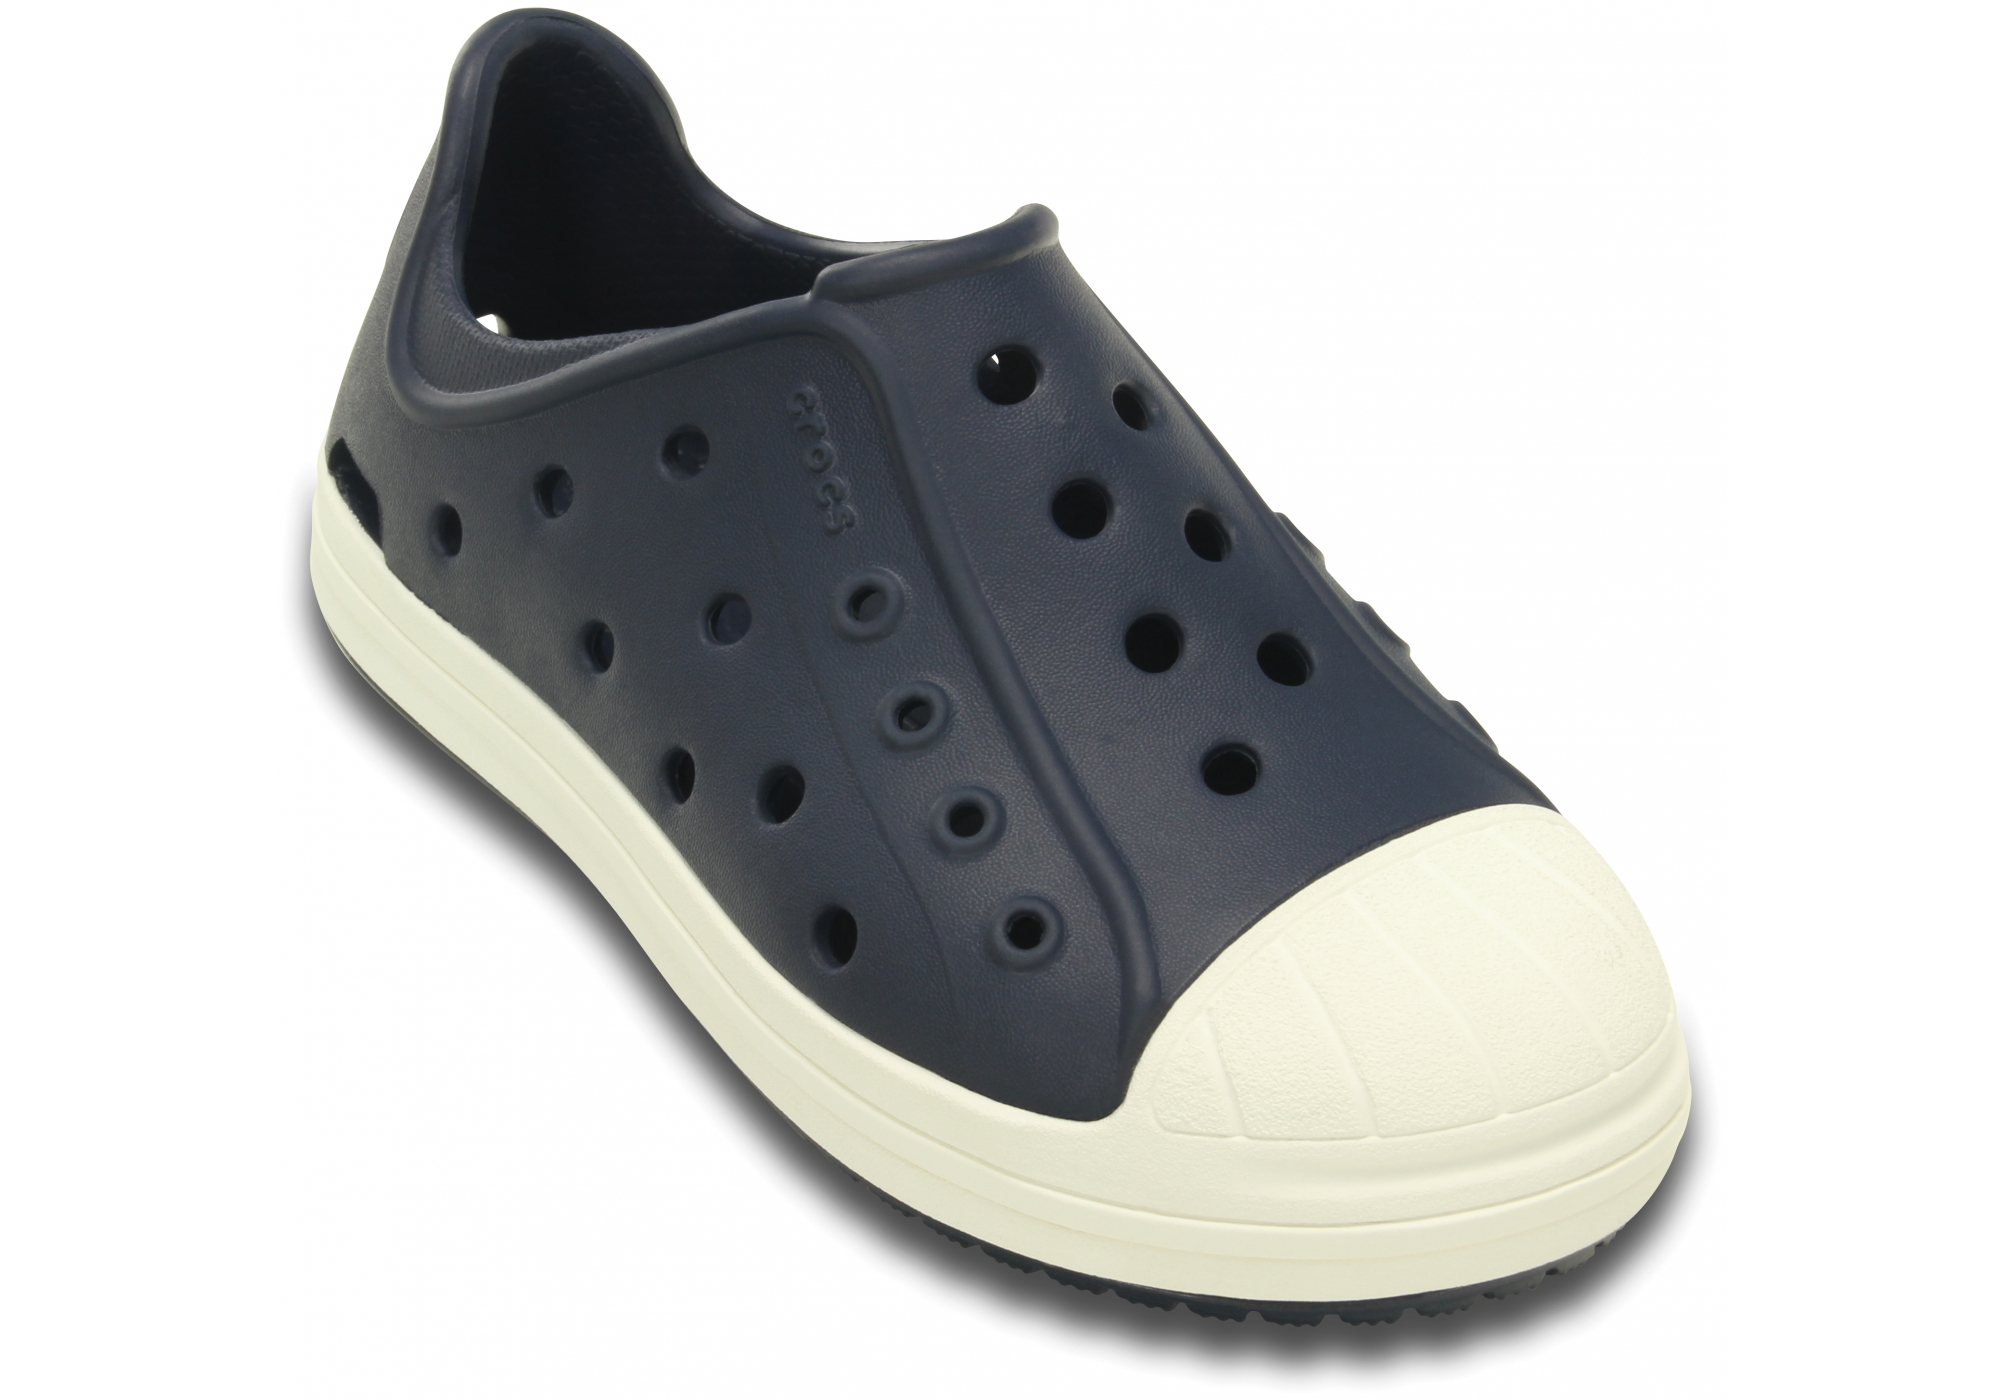 dětské tenisky Crocs Crocs Bump It Shoe Kids  5a86e520641